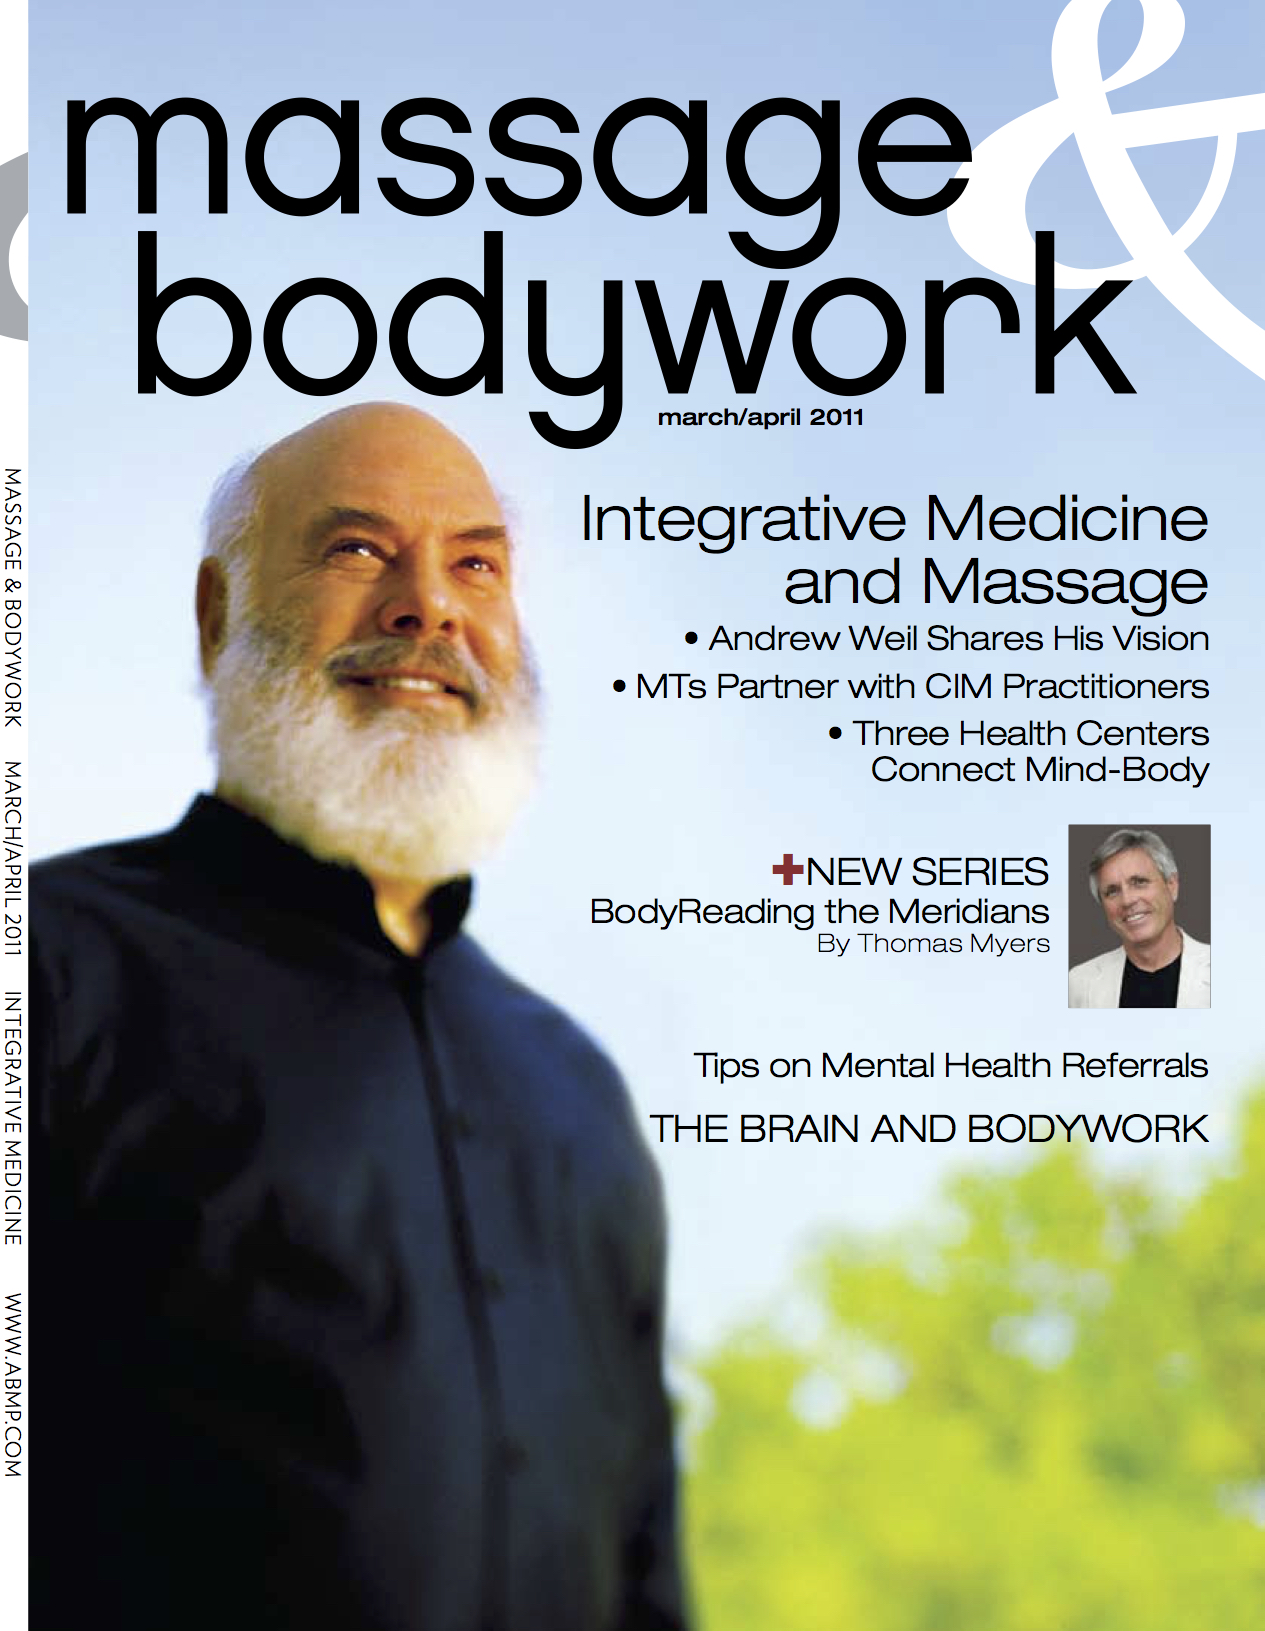 Massage & Bodywork - March / April 2011